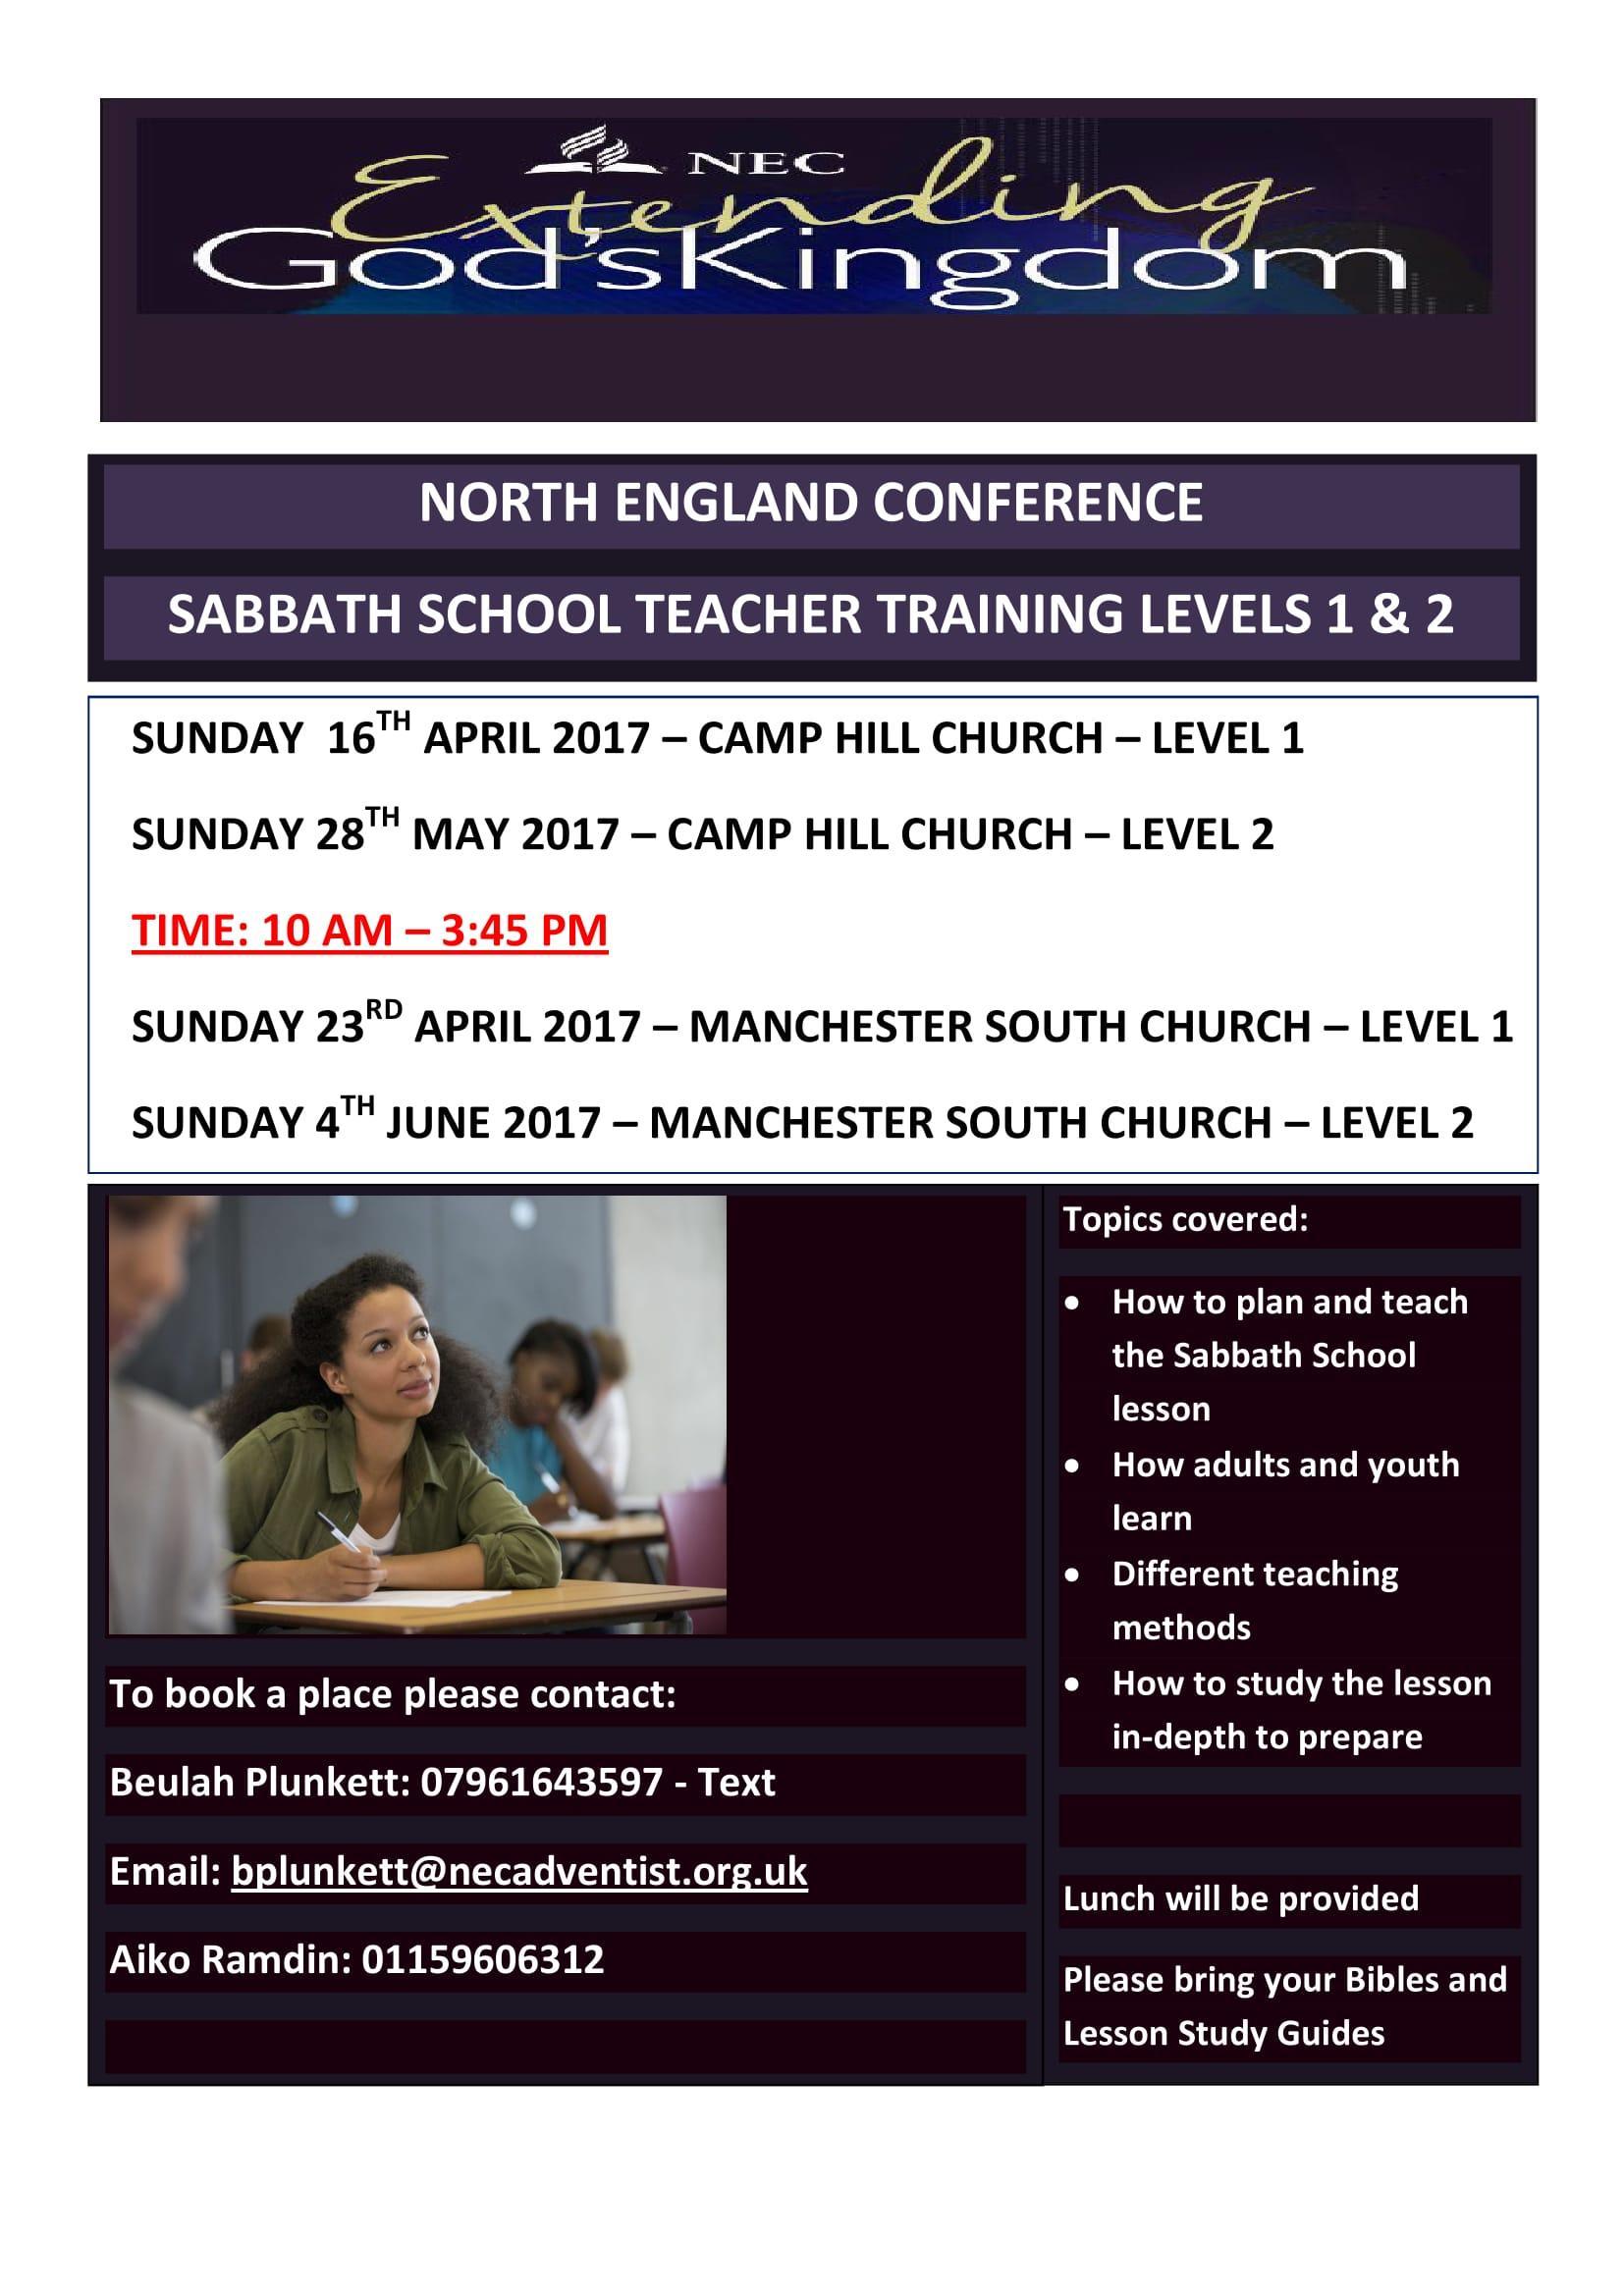 Sabbath School Teacher Training Level 2 - Bir